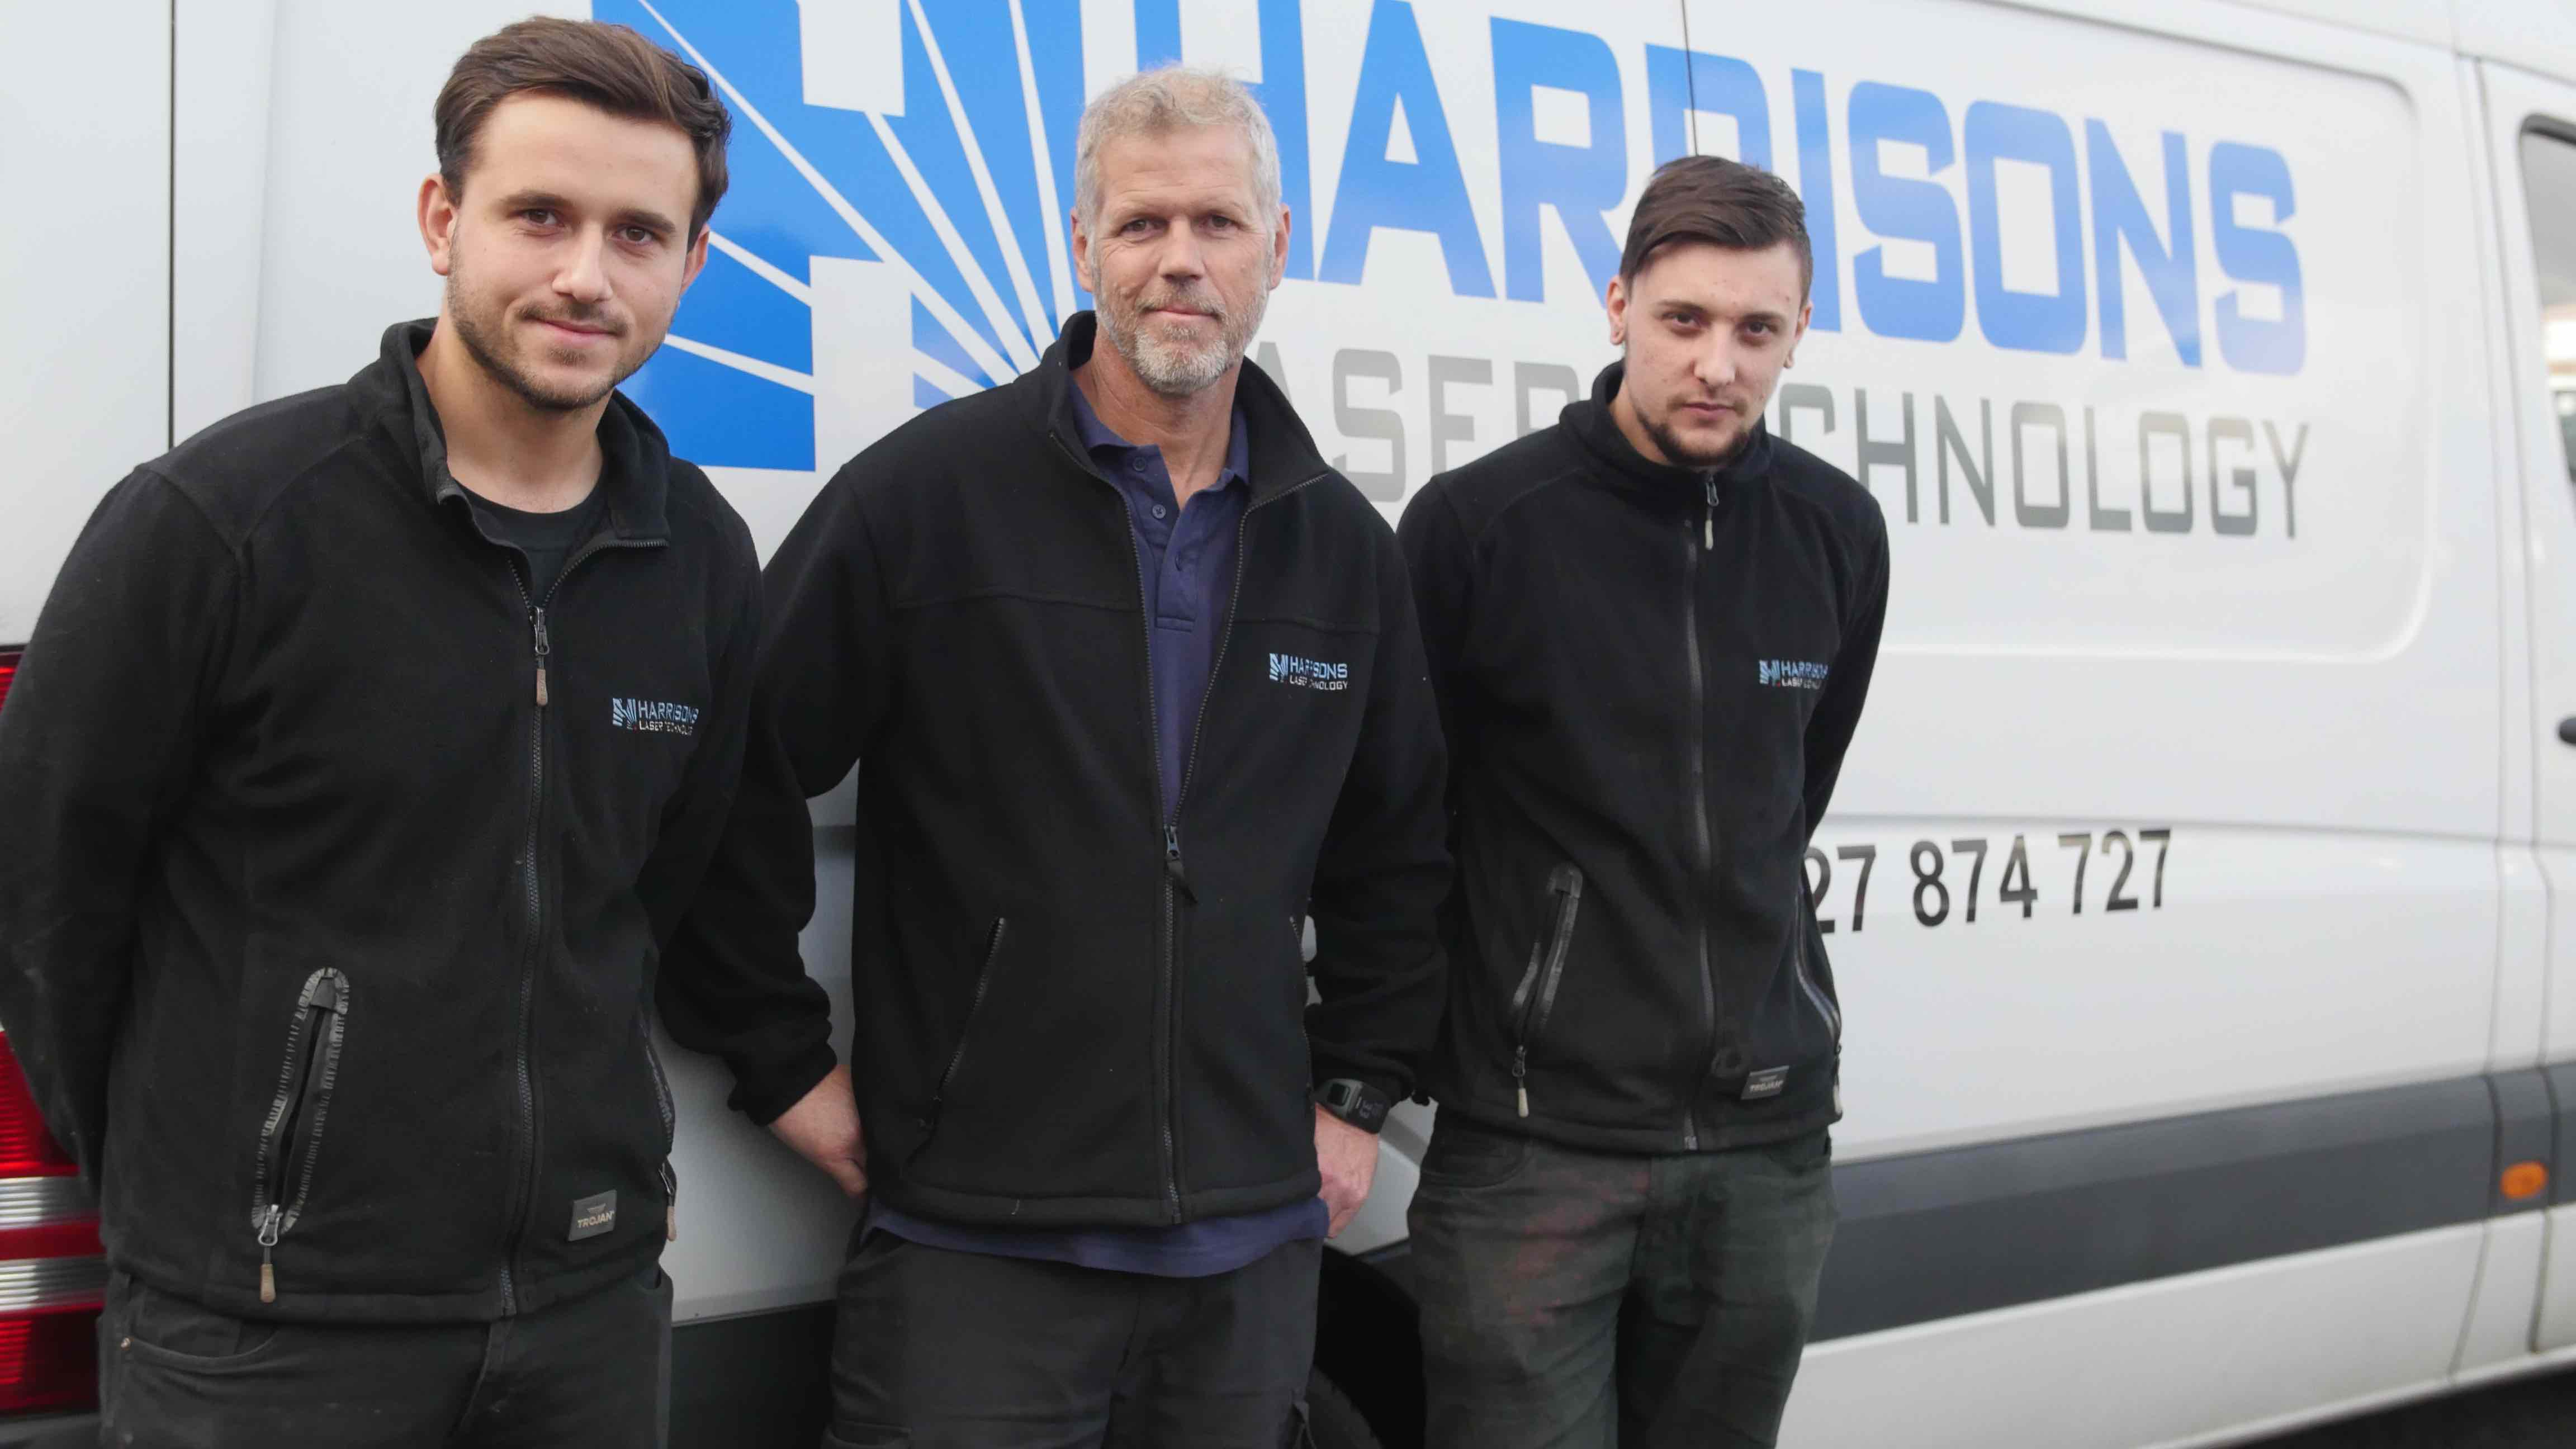 Harrisons Laser Technology